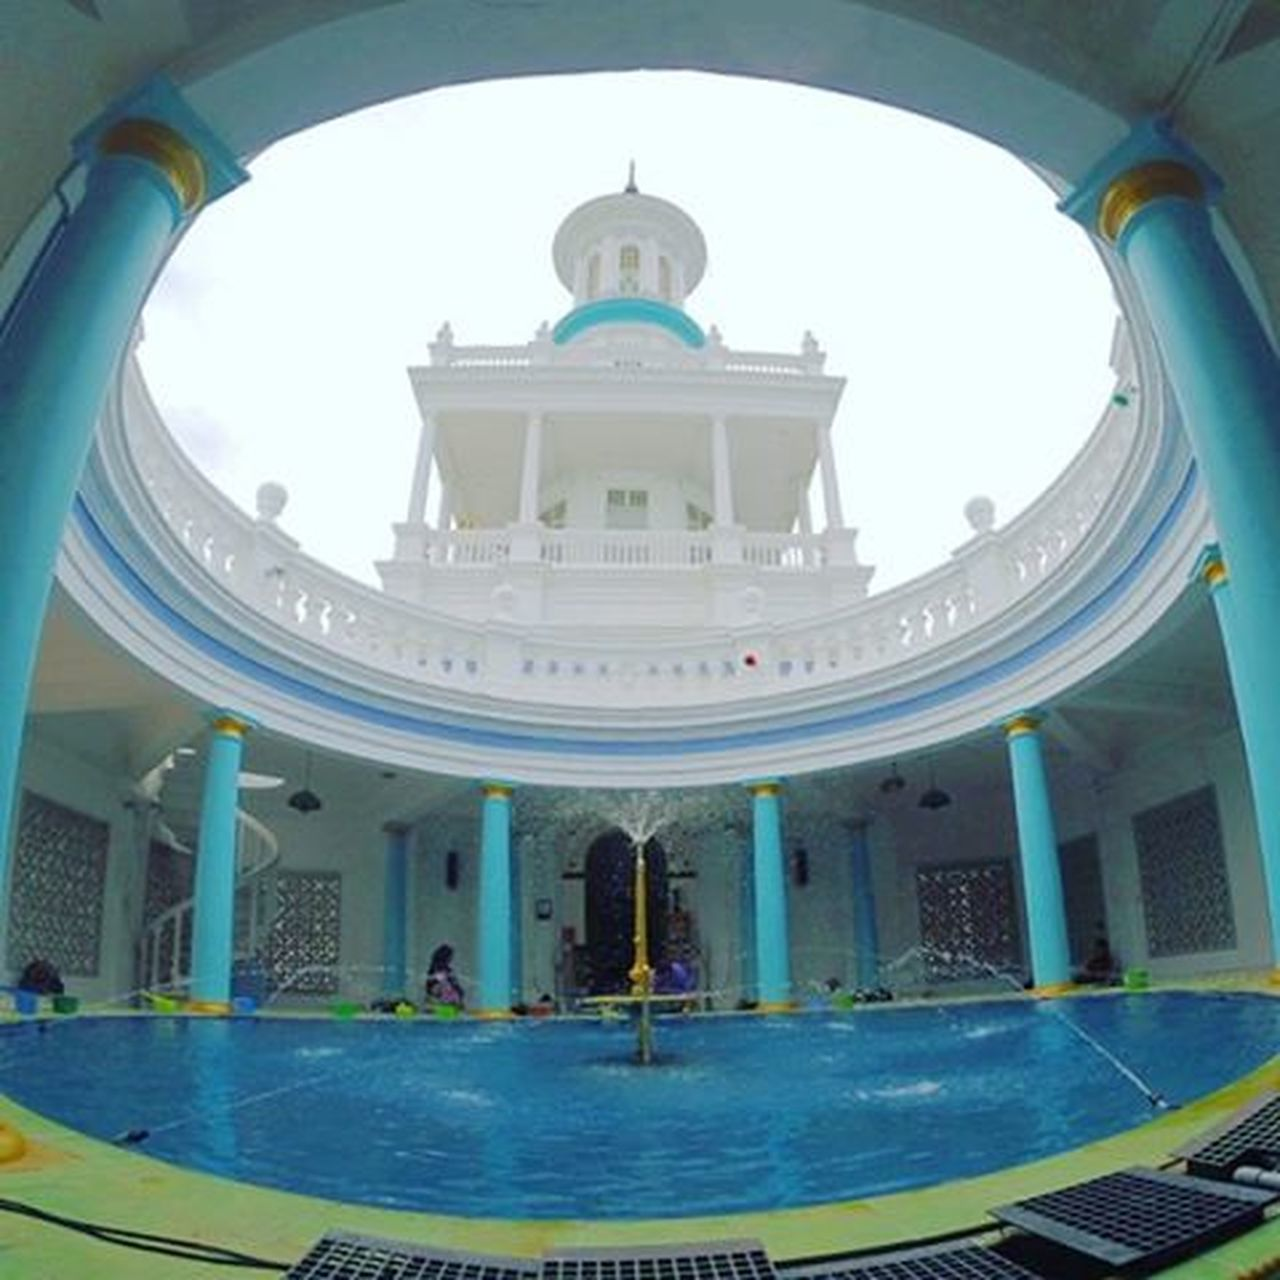 Masjid Sultan Ibrahim Muar Mosque Masjid JJCM Jalanjalancarimasjid Jalanjohorcarimakan Muar Johor Roadtrip Luaskanpandangan Redahjalanlama